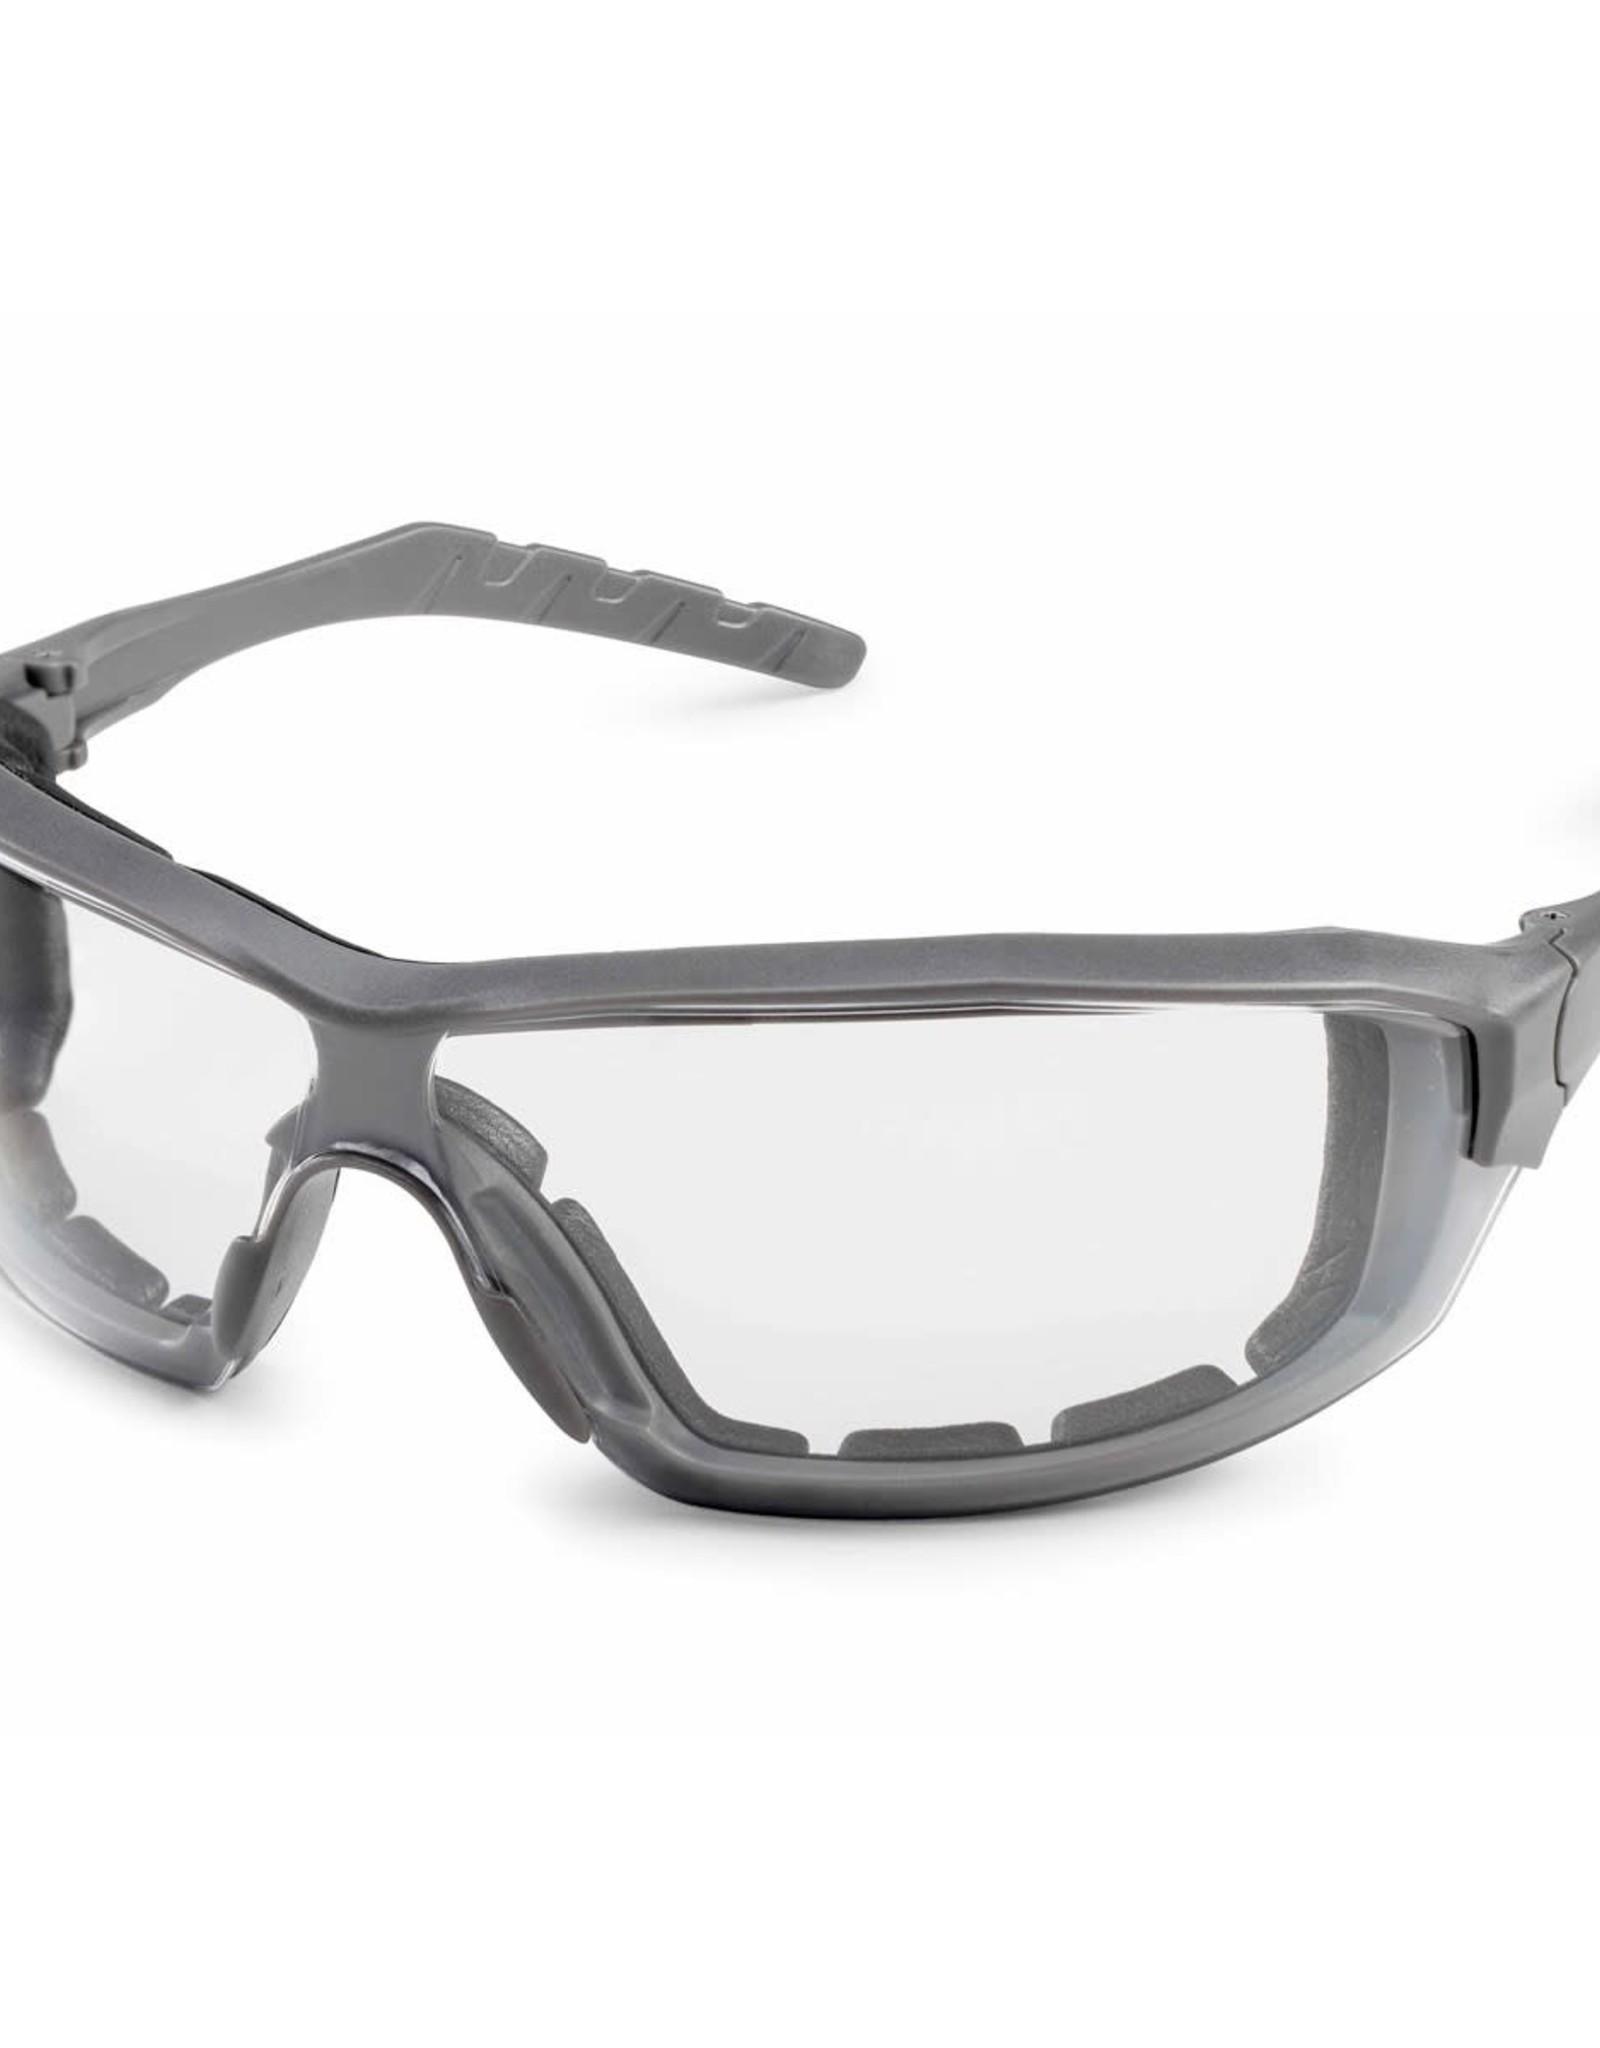 Gateway Silverton Clear Safety Glasses, Clear fX2 Anti-Fog Lens